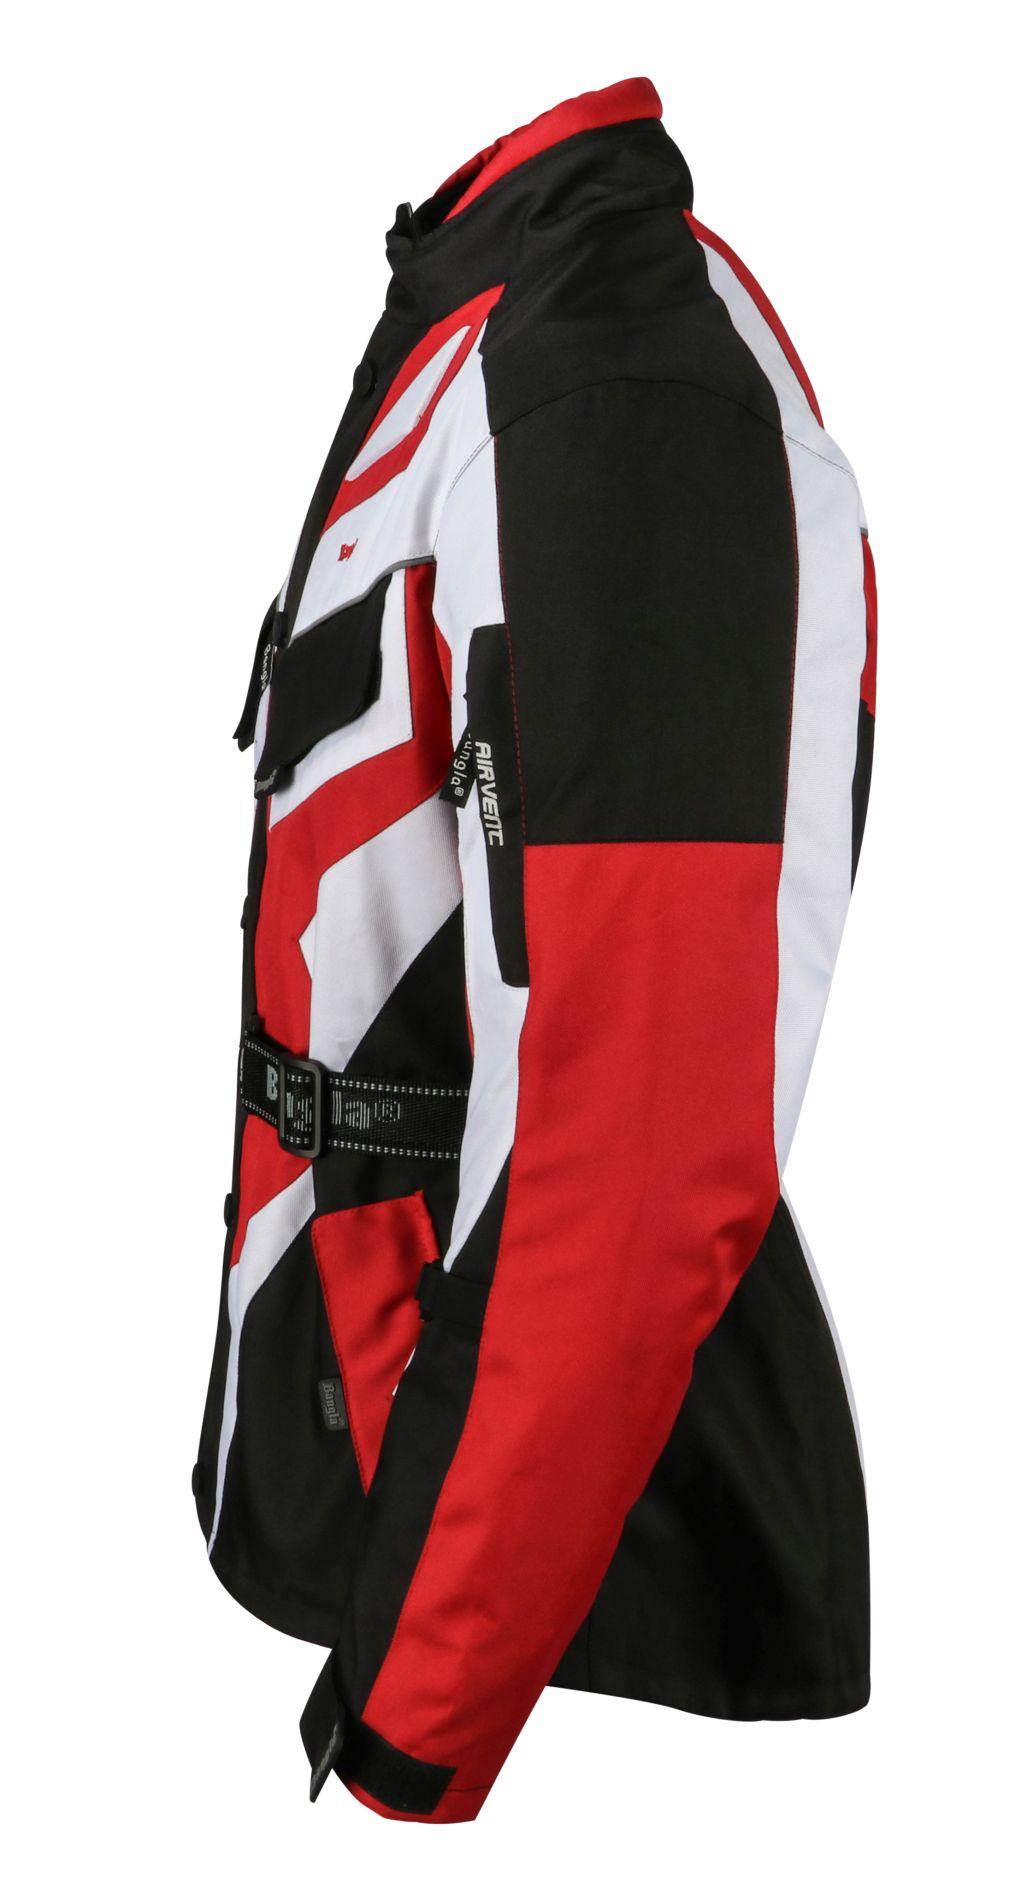 Kinder Motorradjacke Motorrad Textil Jacke Cordura rot schwarz weiss 128-176